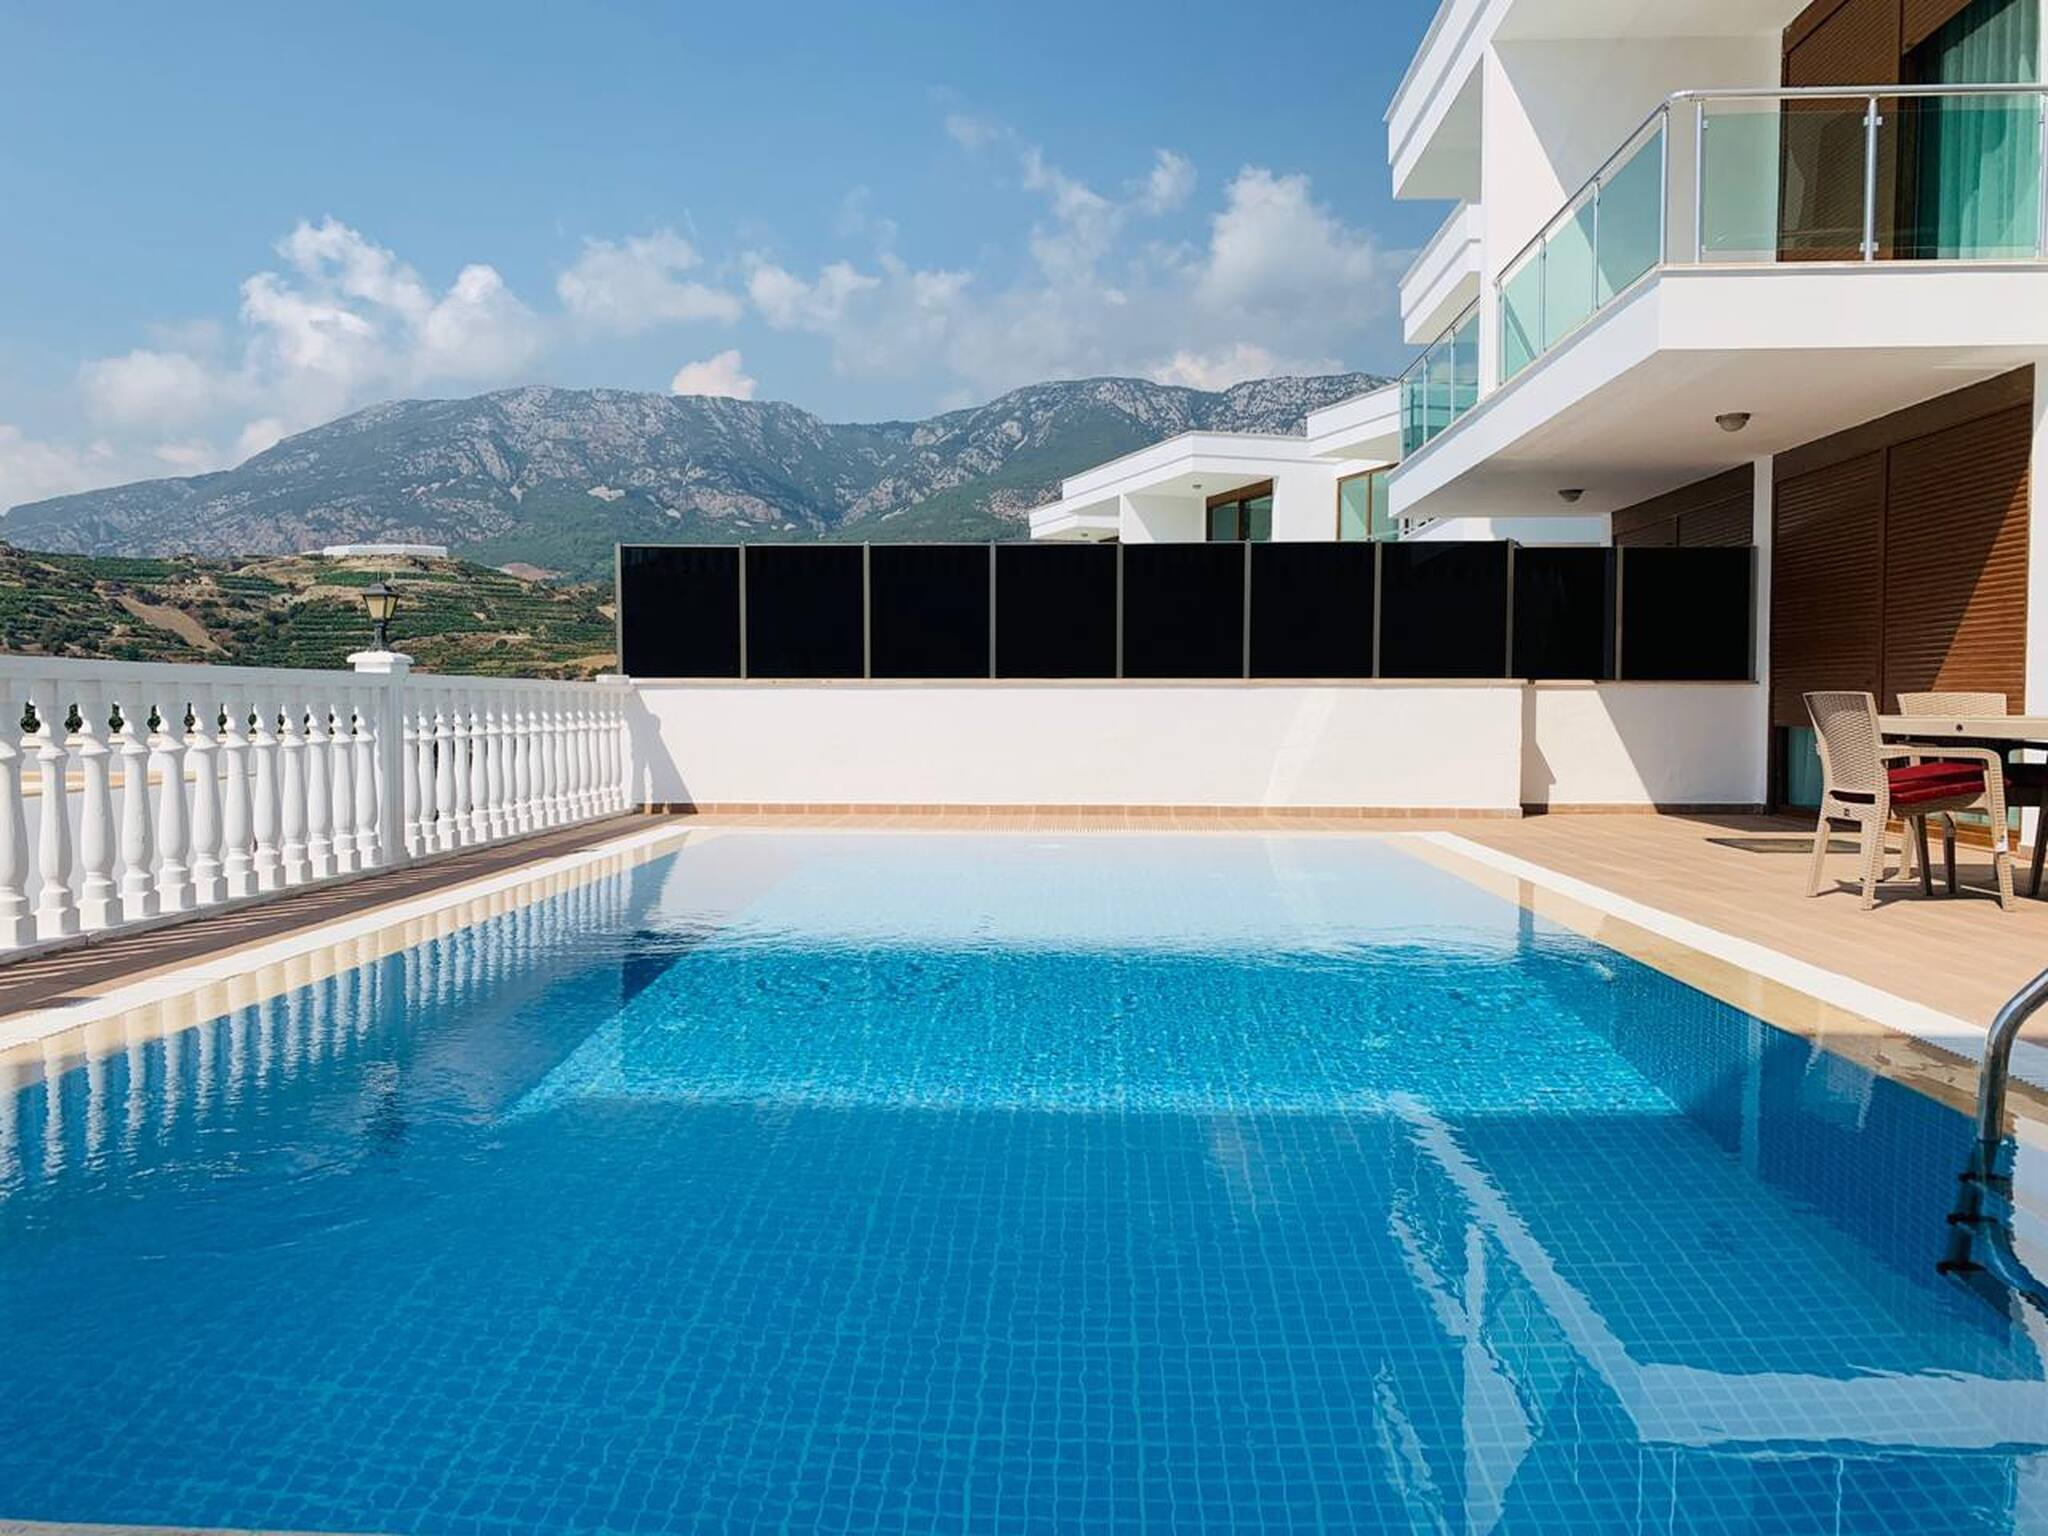 Villa mit privatem Pool 5 Sterne Komplex in Alanya